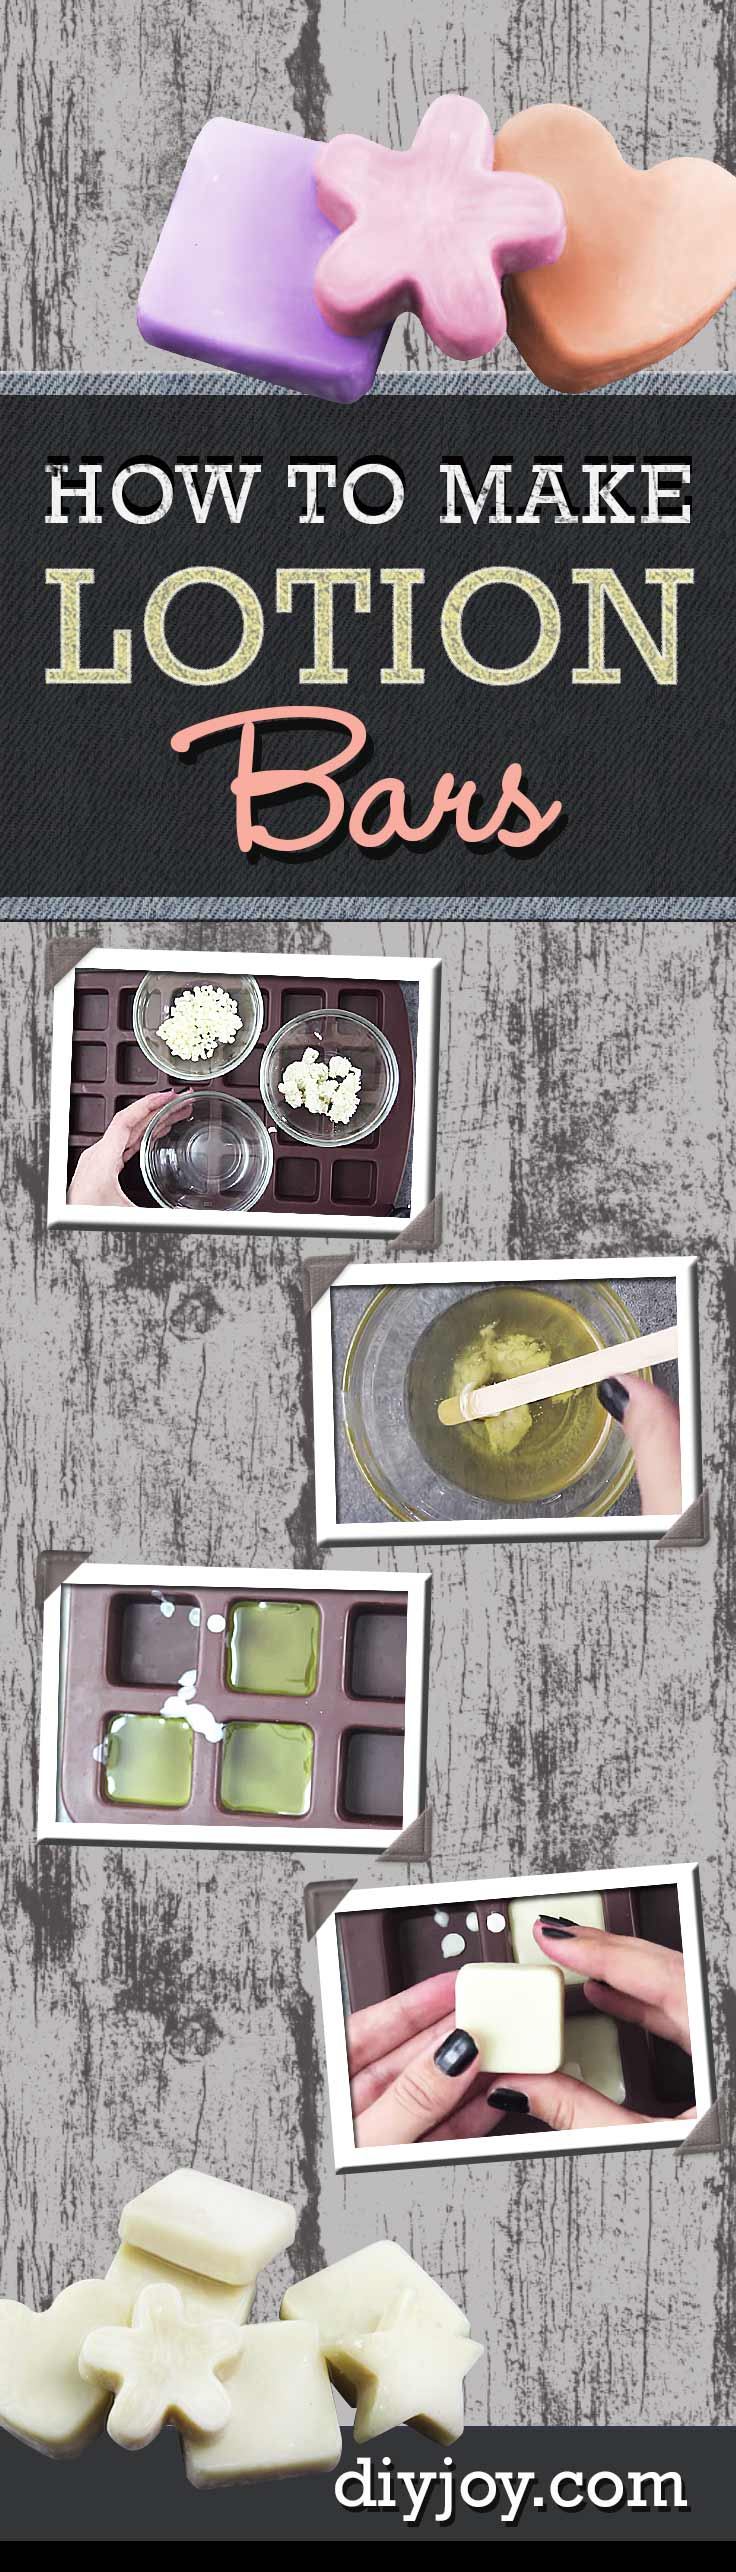 Cool DIY Projects - DIY Lotion Bars Make Cool DIY Gifts. Learn How To Make Homemade Lotion Bars - Recipe Like Lush http://diyjoy.com/diy-lotion-bars